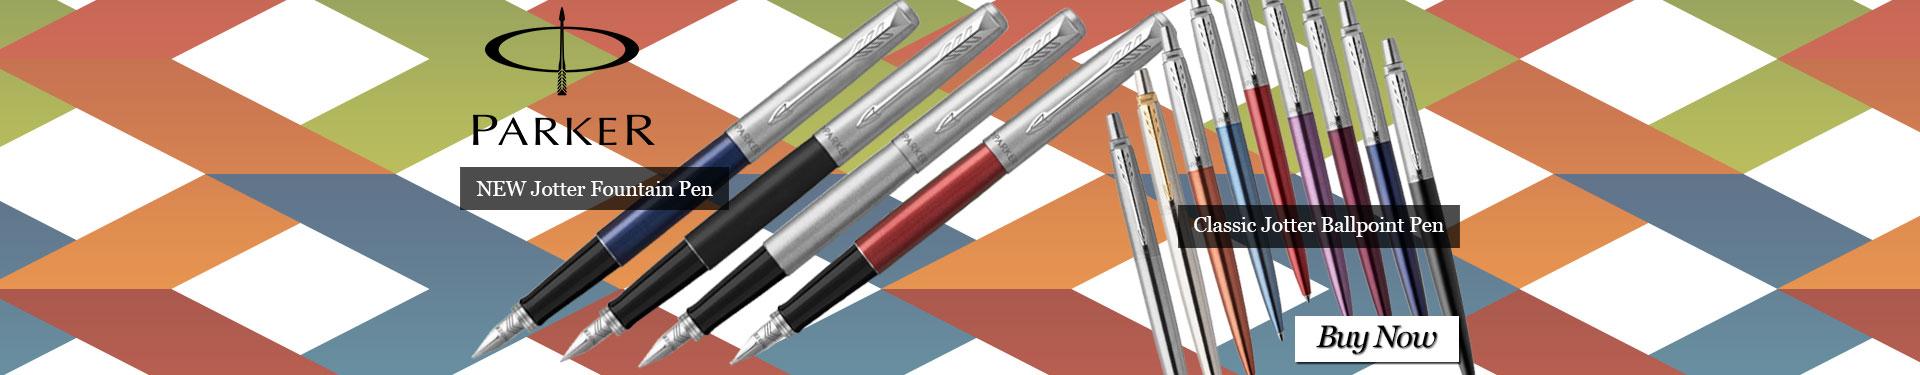 New Parker Jotter Fountain Pen and Parker Classic Jotter Ballpoint Pen